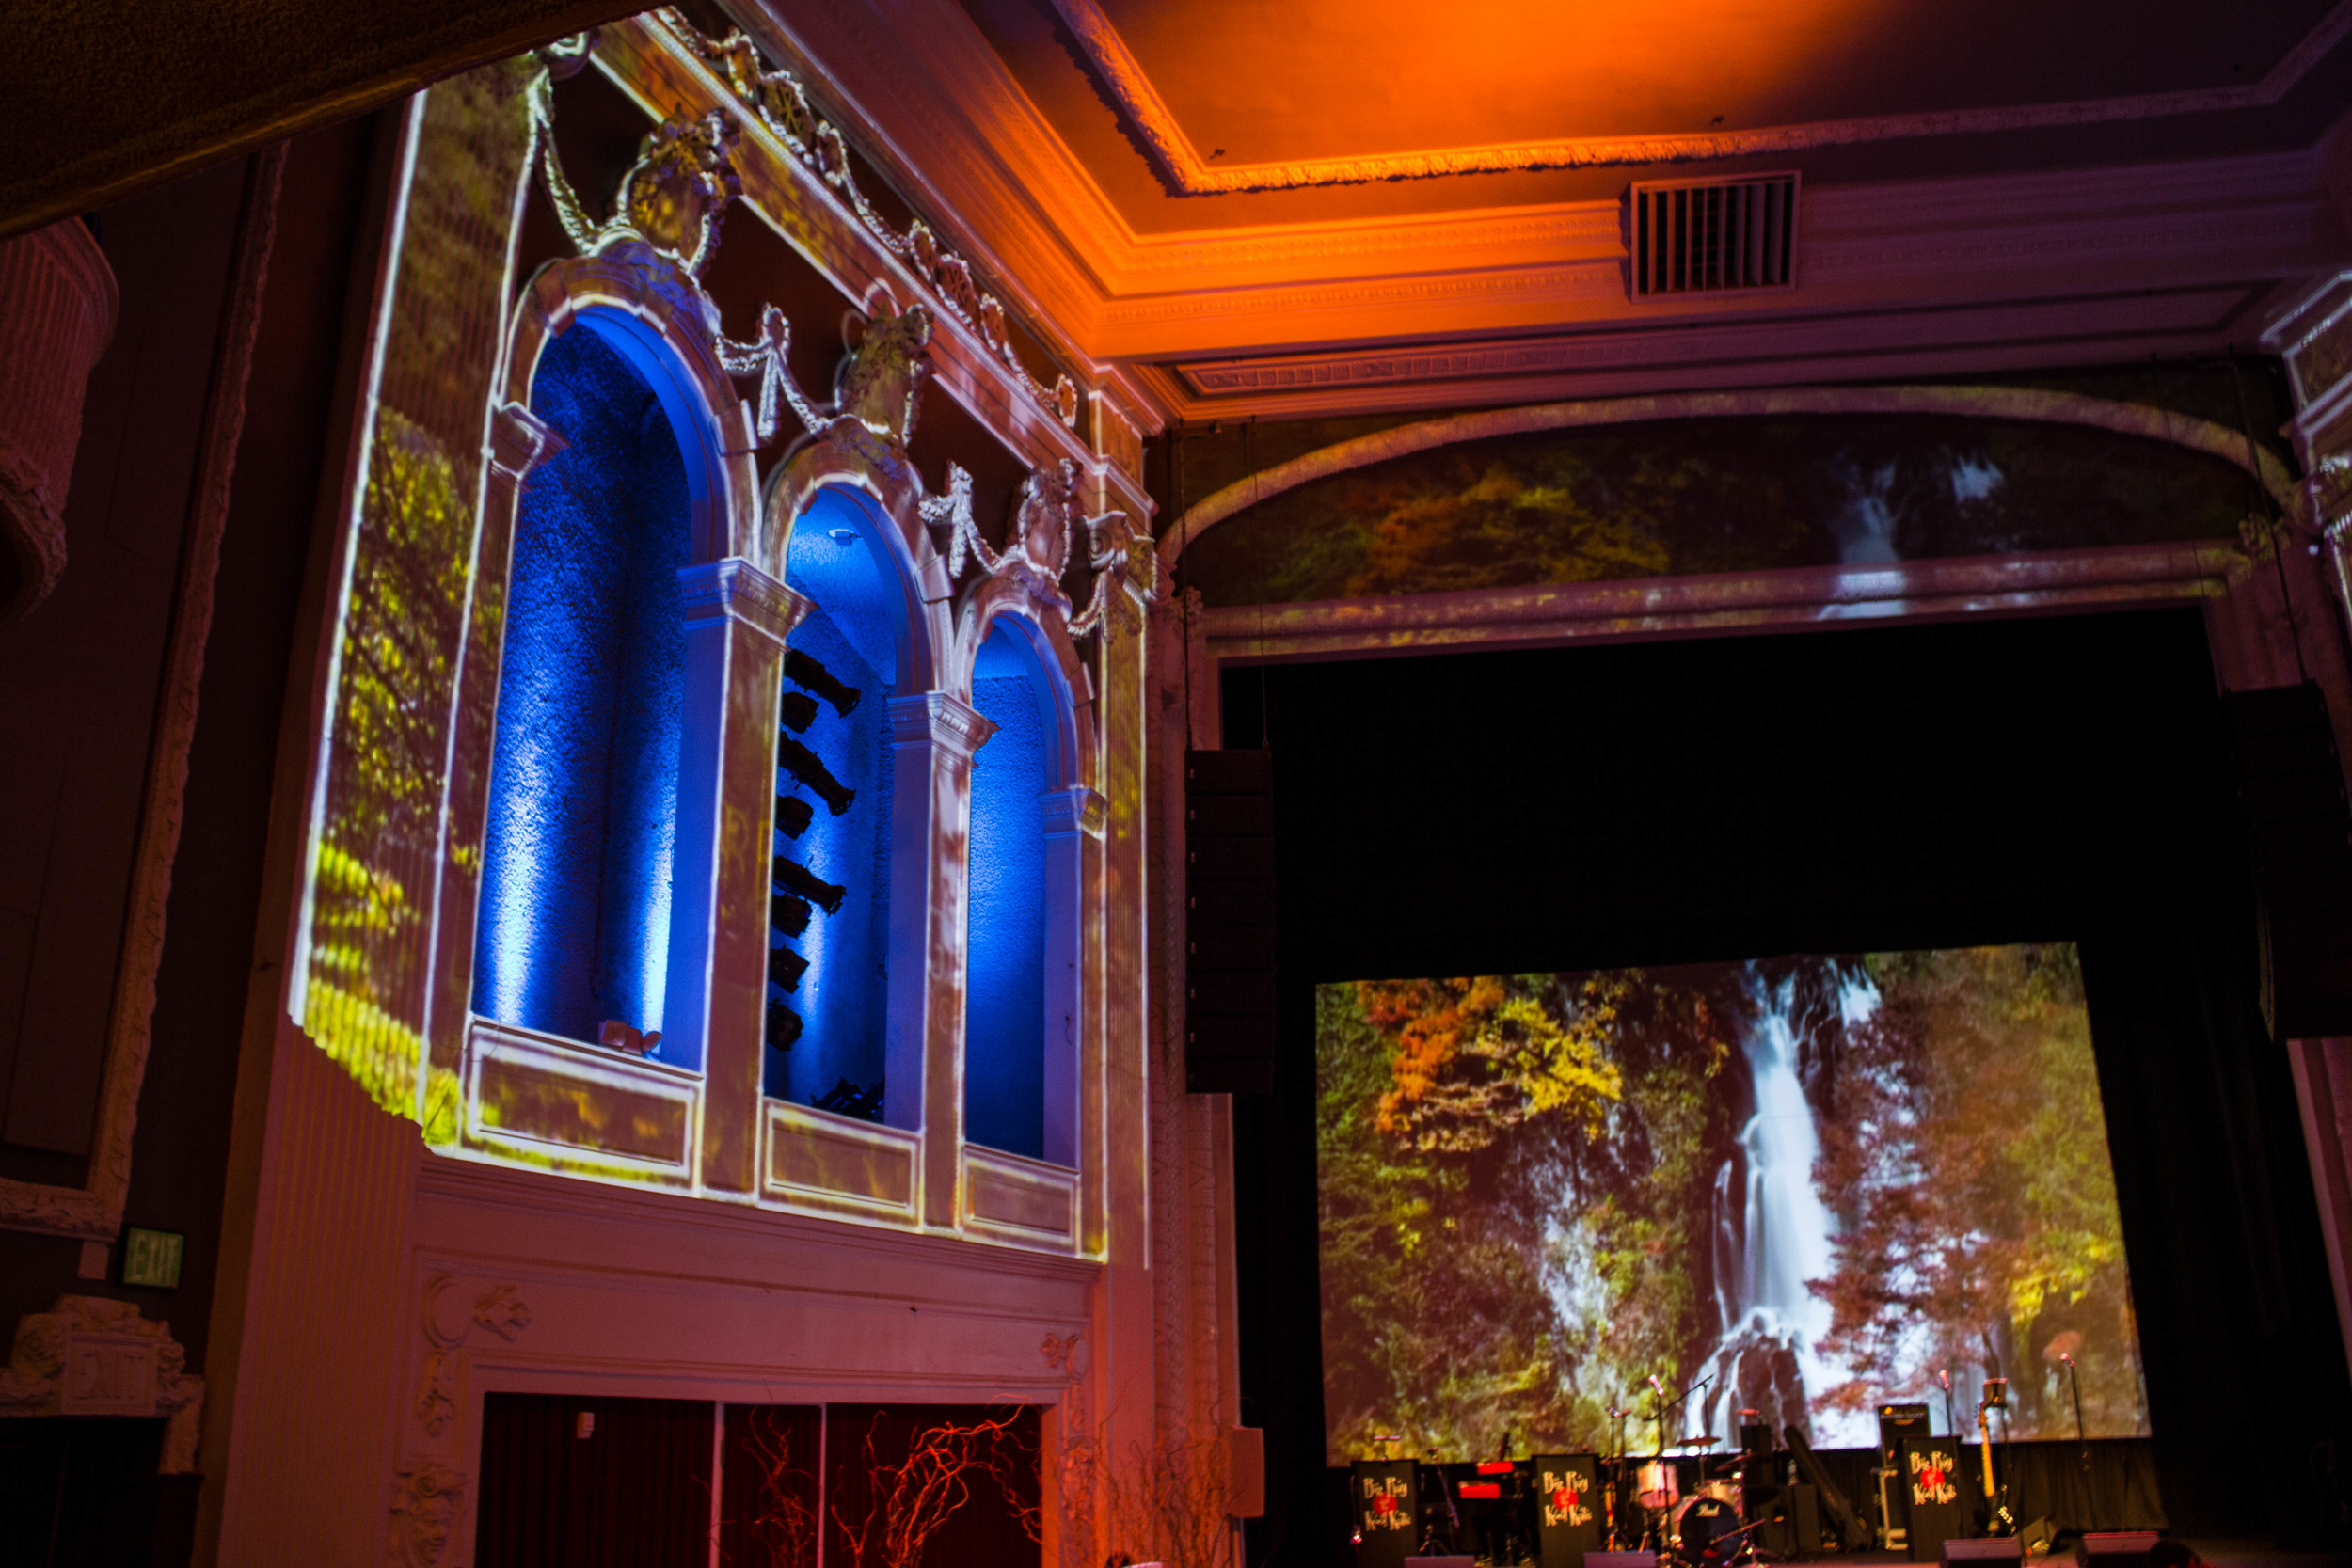 Virginia Film Festival - Rental and Staging - Live Events - Festivals - The AV Company